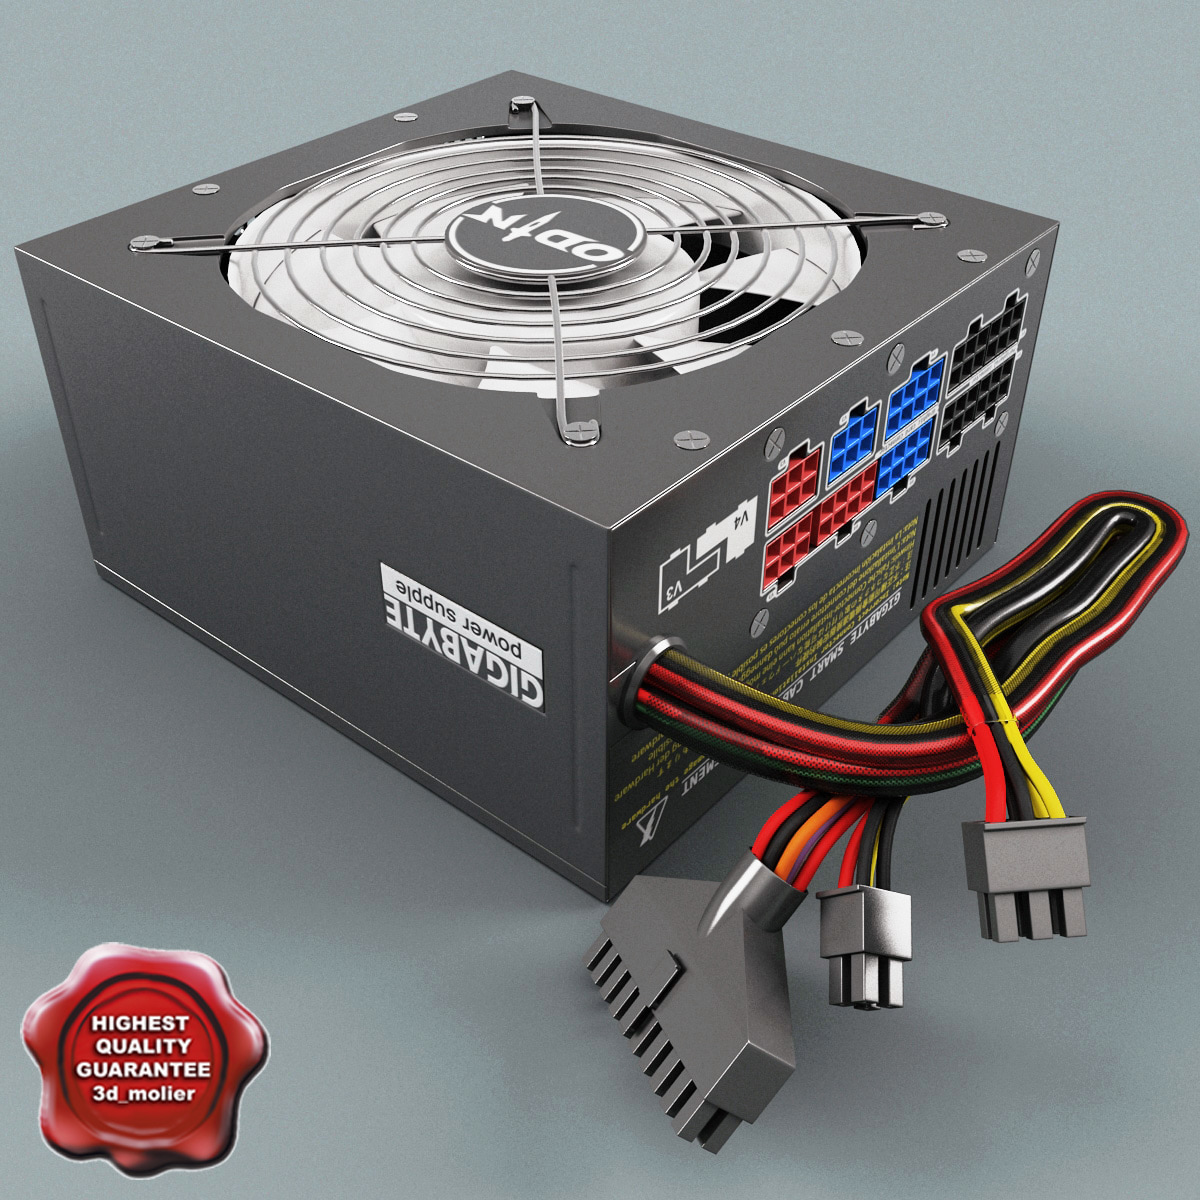 PC_Power_Supply_Unit_Gigabyte_00.jpg